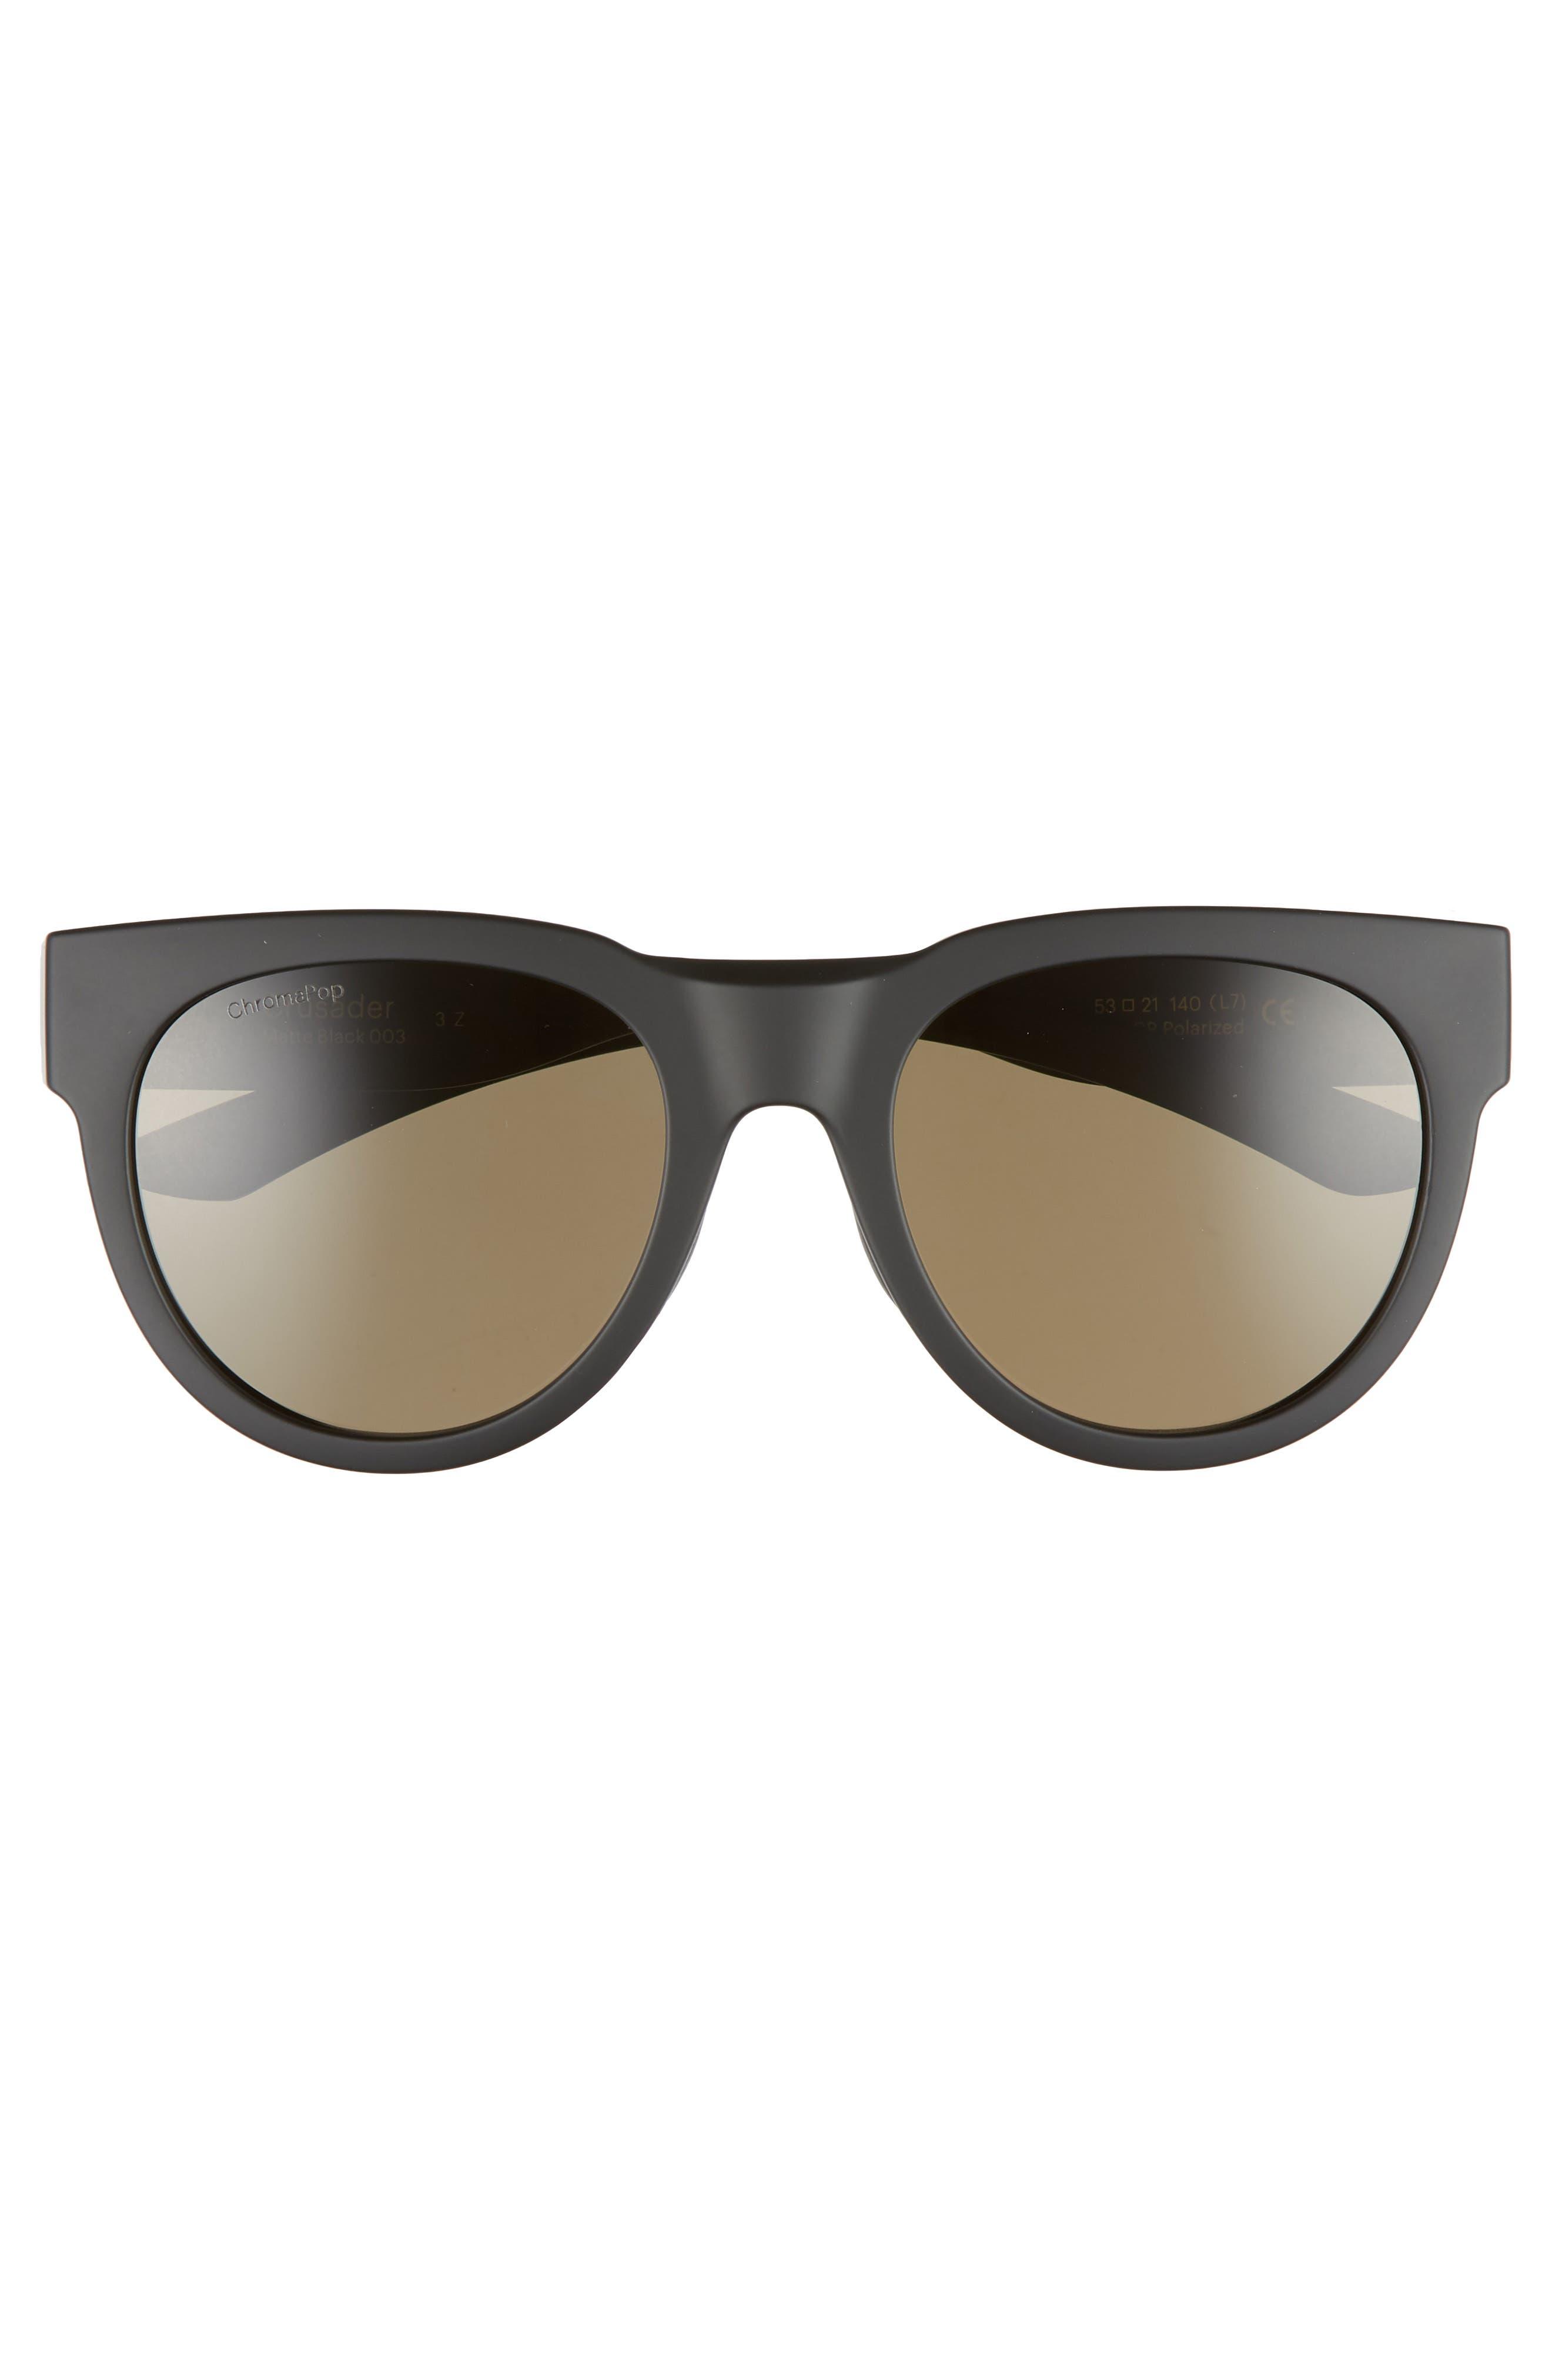 Crusader 53mm ChromaPop<sup>™</sup> Polarized Round Sunglasses,                             Alternate thumbnail 2, color,                             MATTE BLACK/ GREY GREEN